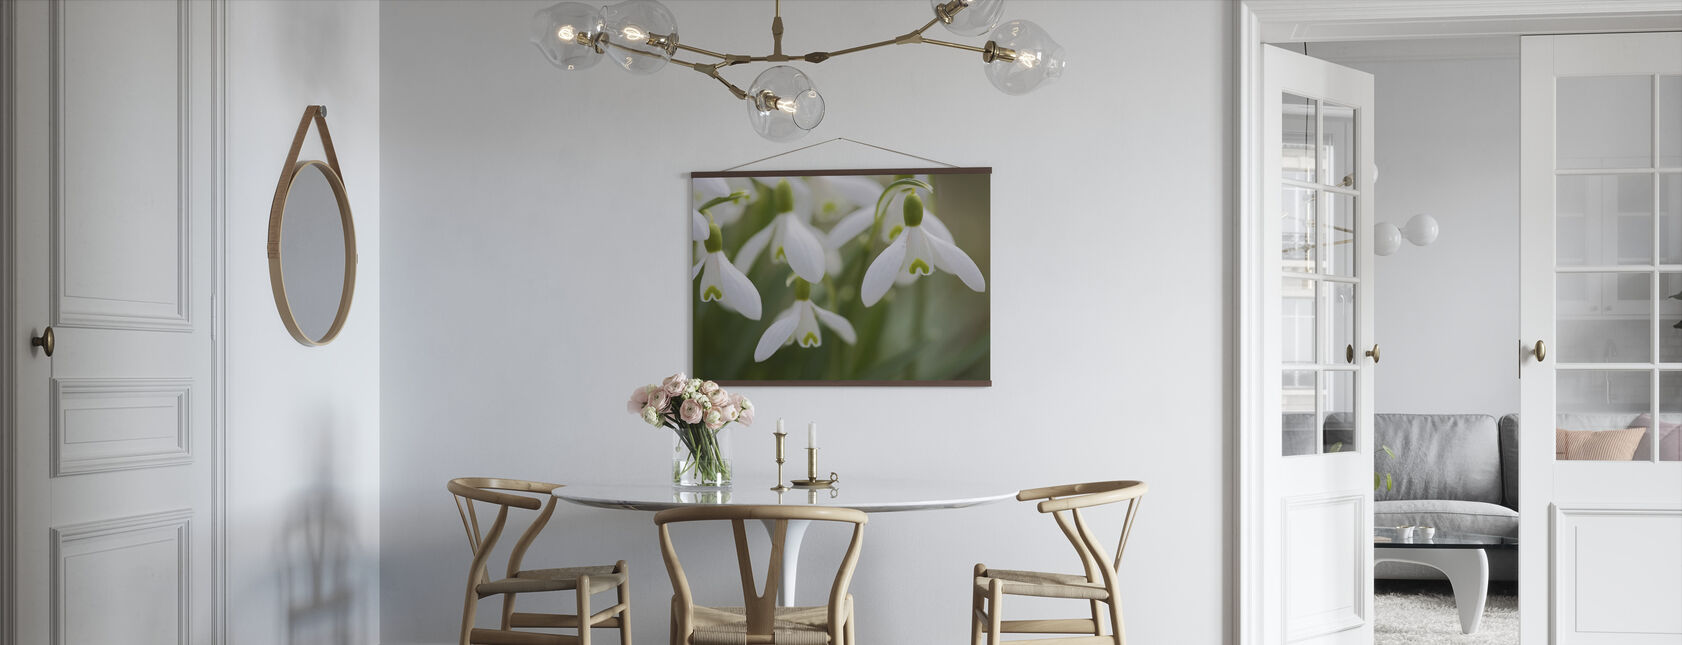 Sneeuwdruppels - Poster - Keuken